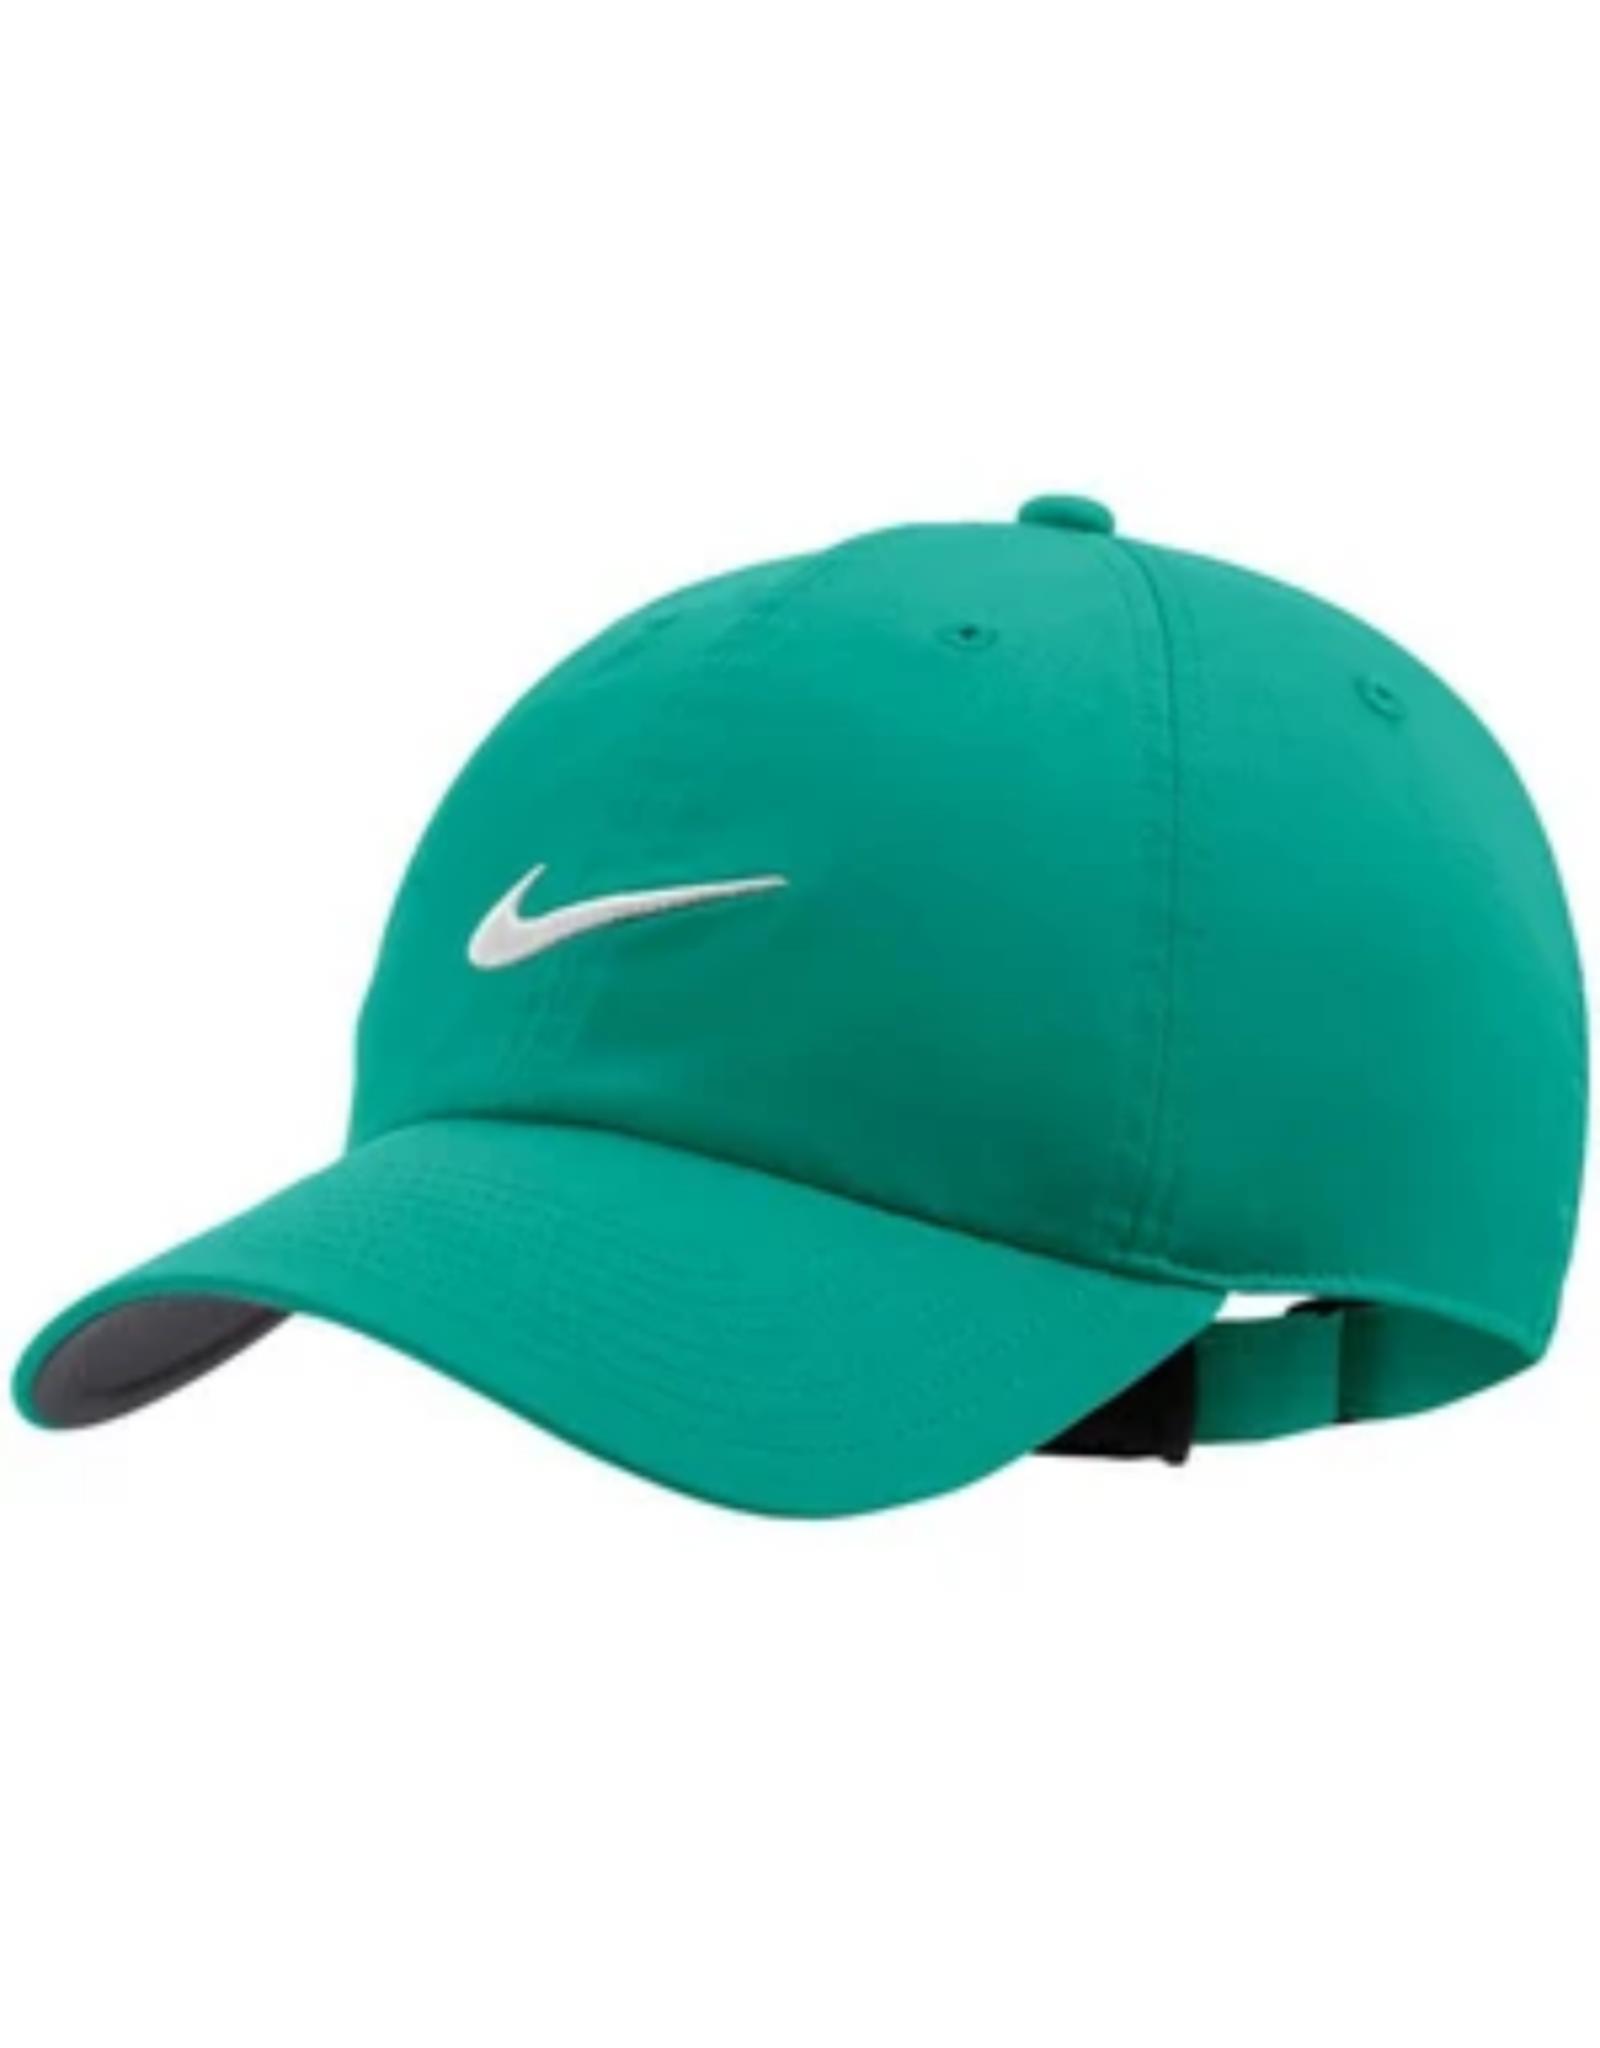 Nike Heritage 86 Hat Green Adjustable